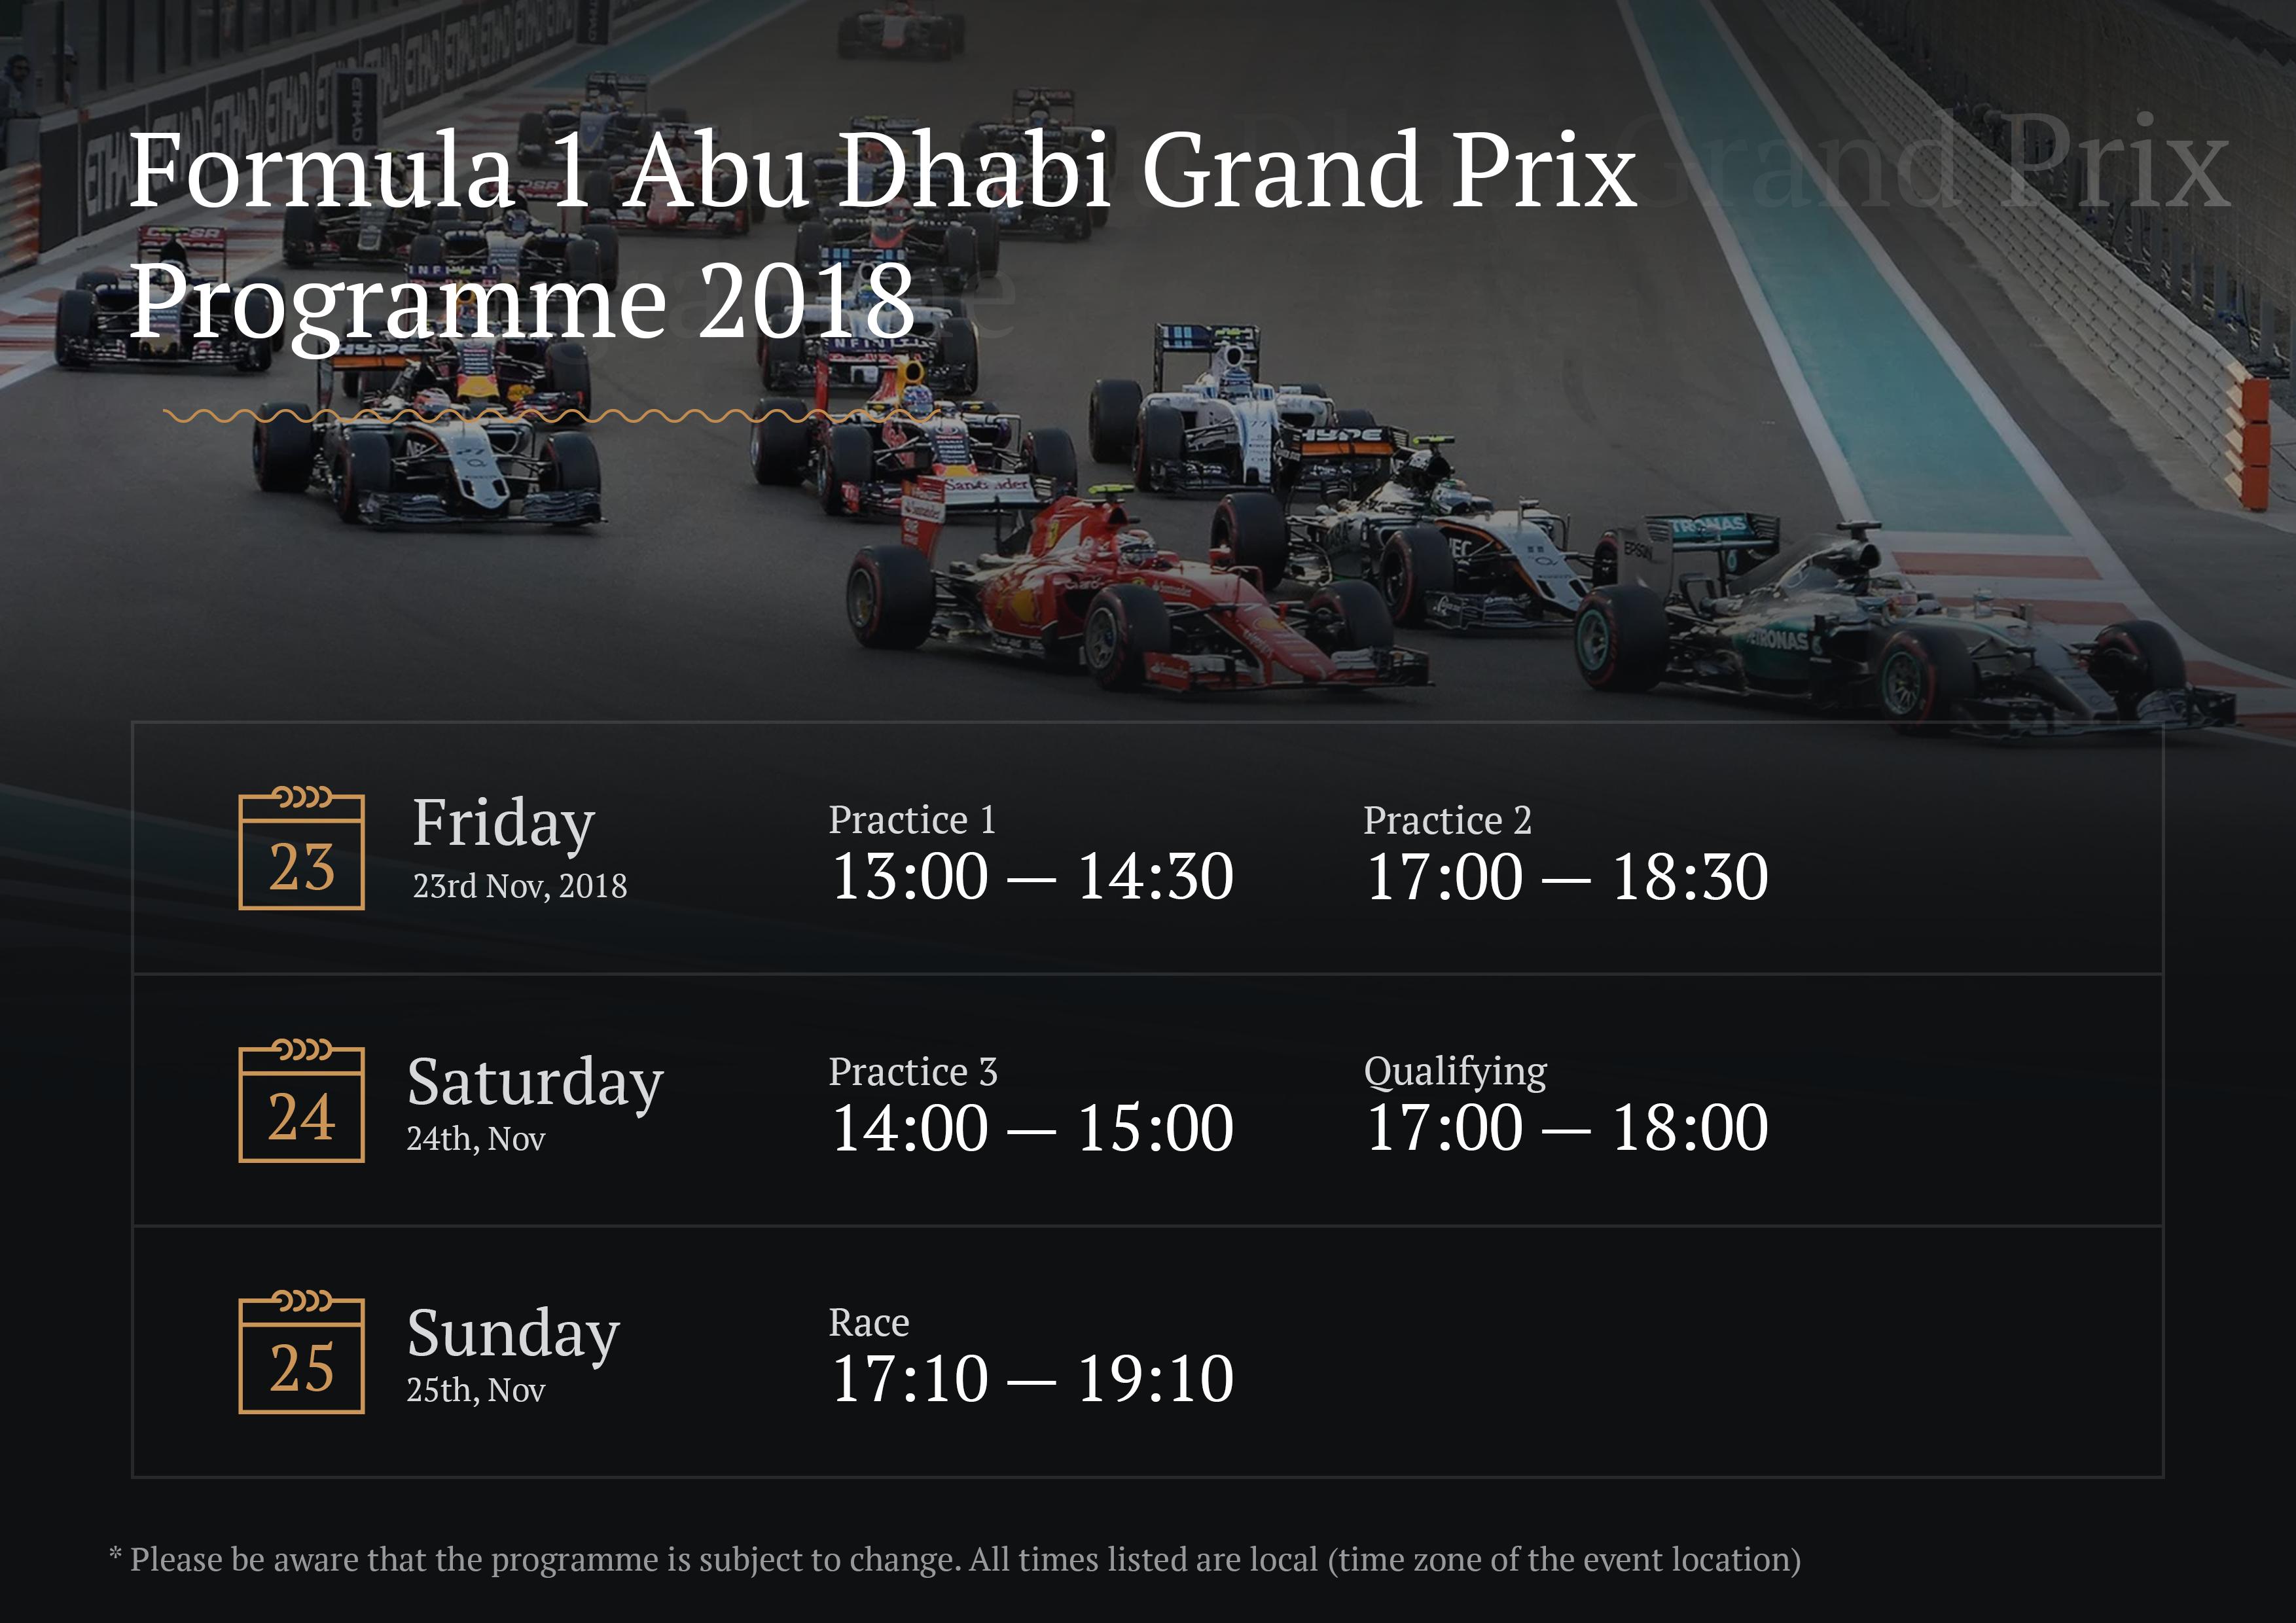 Formula 1 2018 Etihad Airways Abu Dhabi Grand Prix - Luxury Yachting